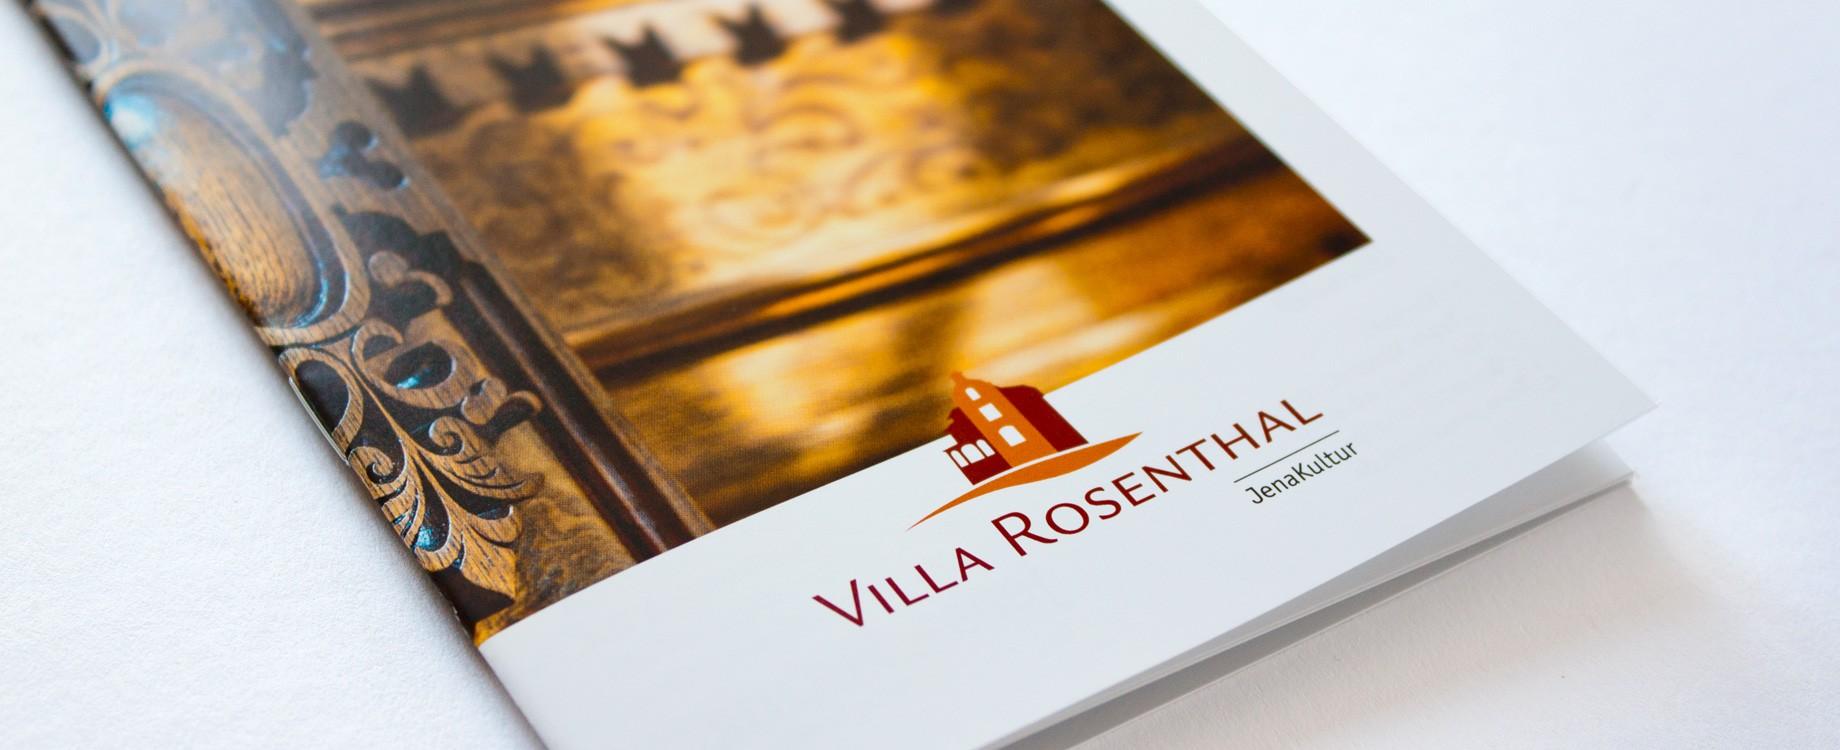 Villa Rosenthal Jena · Titel